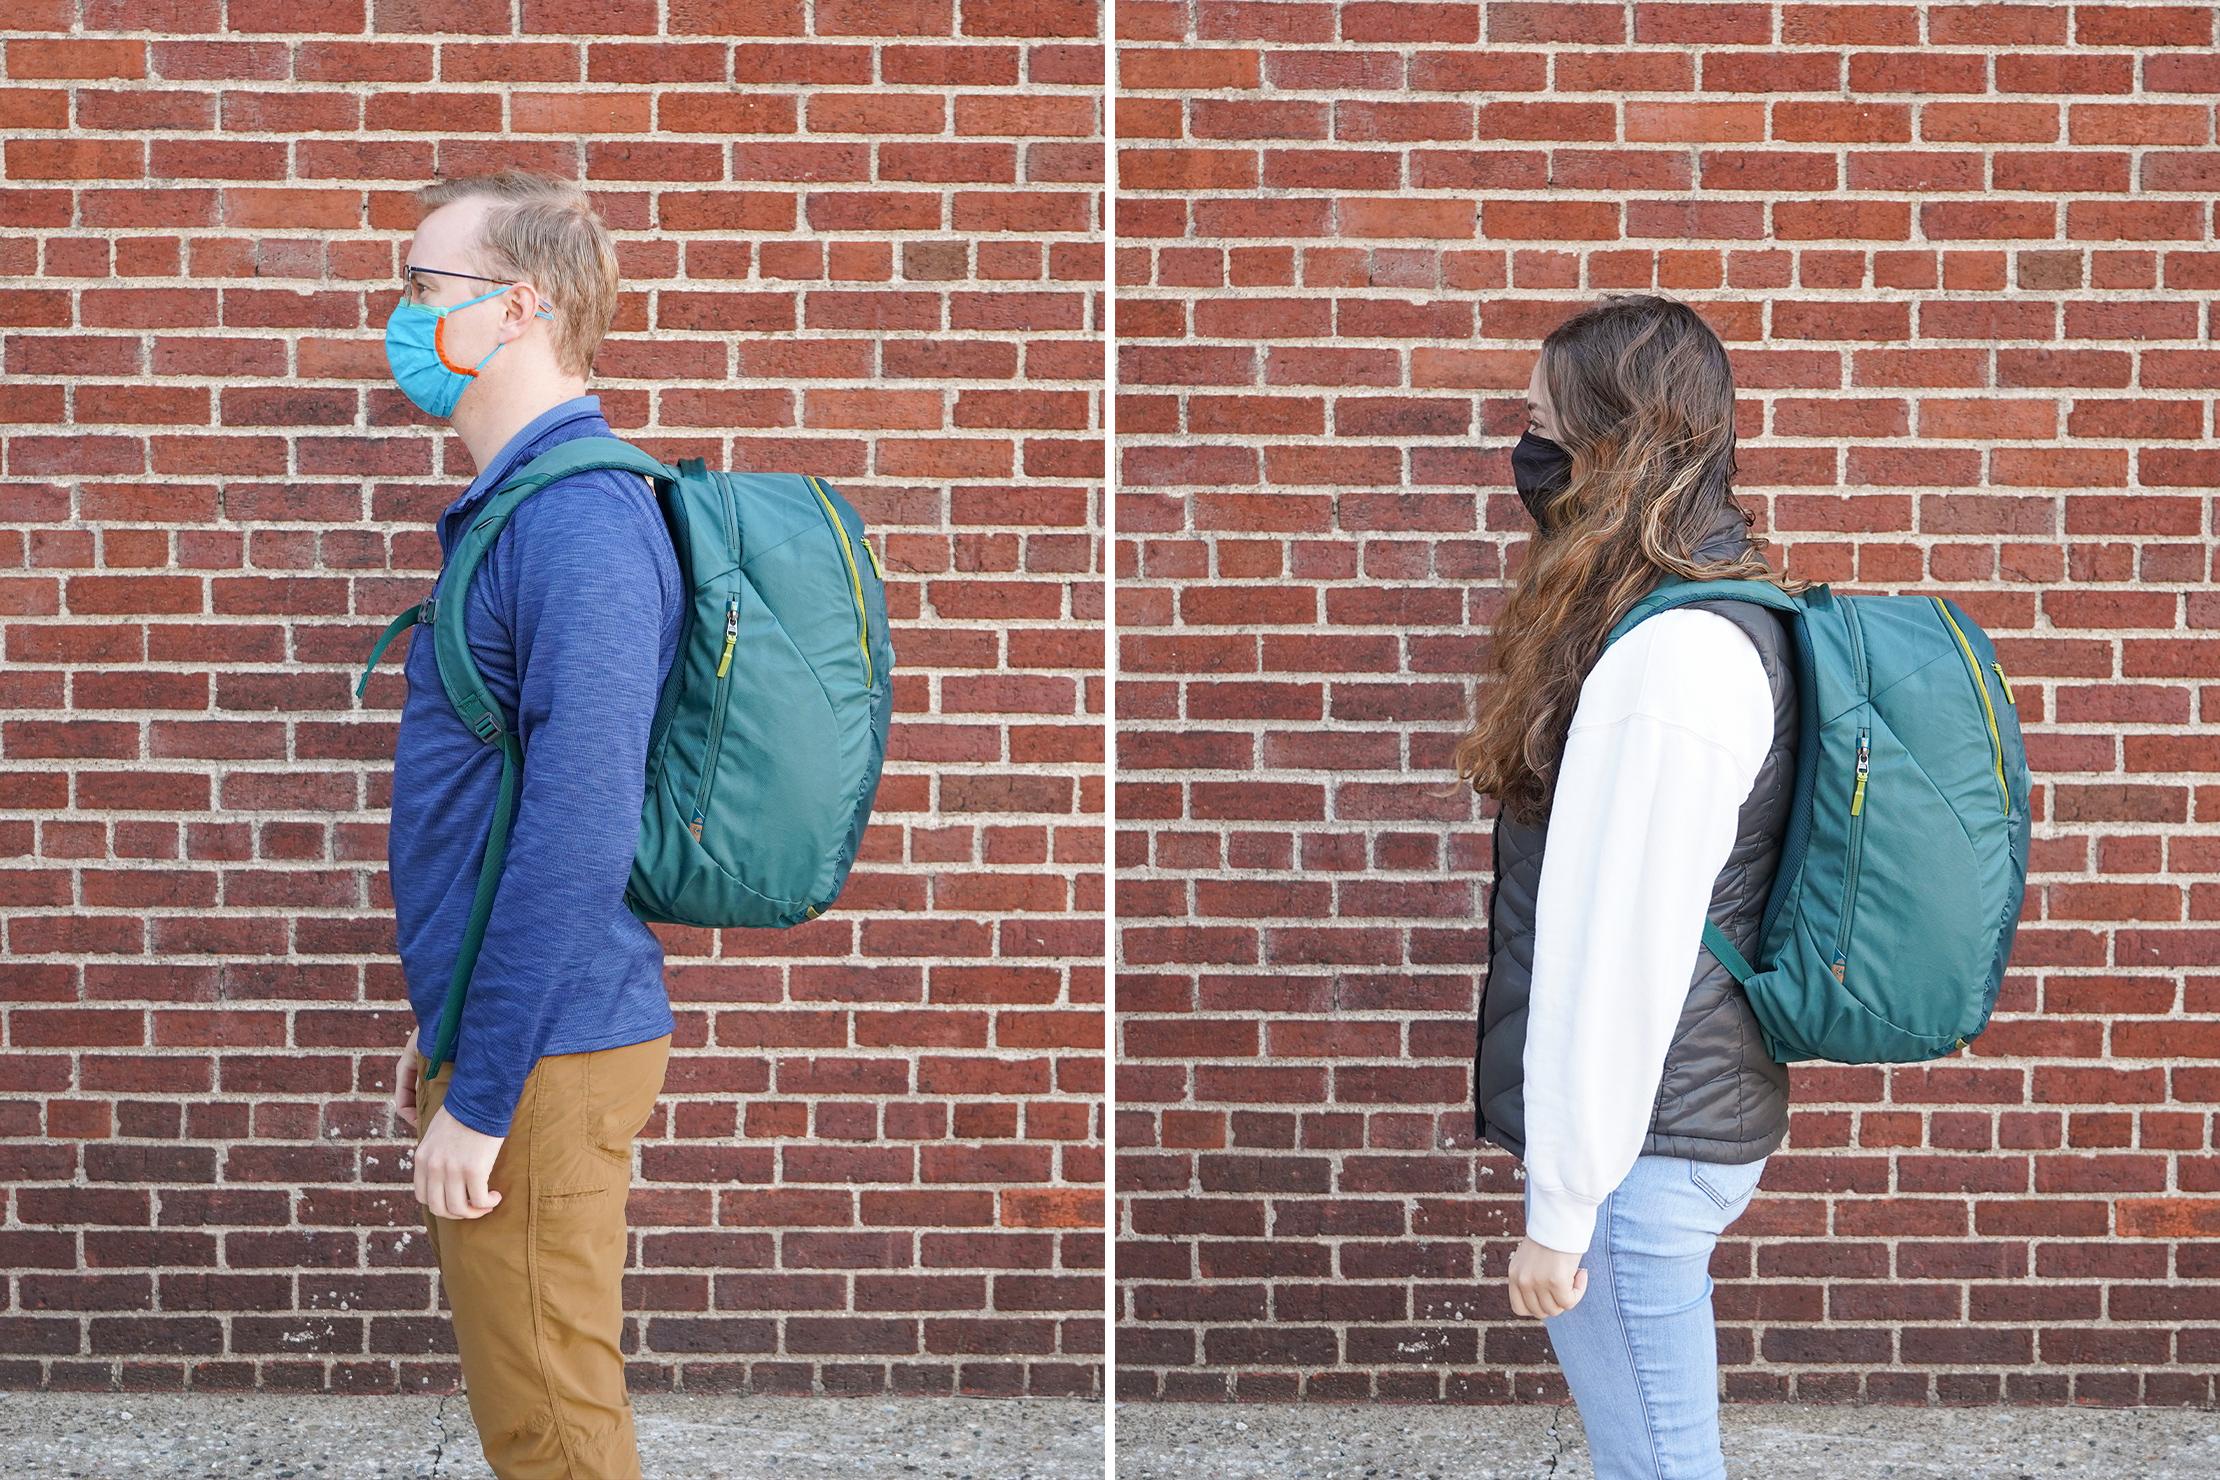 "Left: Mark, Height, 5'10"" (178 cm), Torso: 19"" (48cm)   Right: Riley, Height, 5'4"" (162 cm), Torso: 16.5"" (42 cm)"